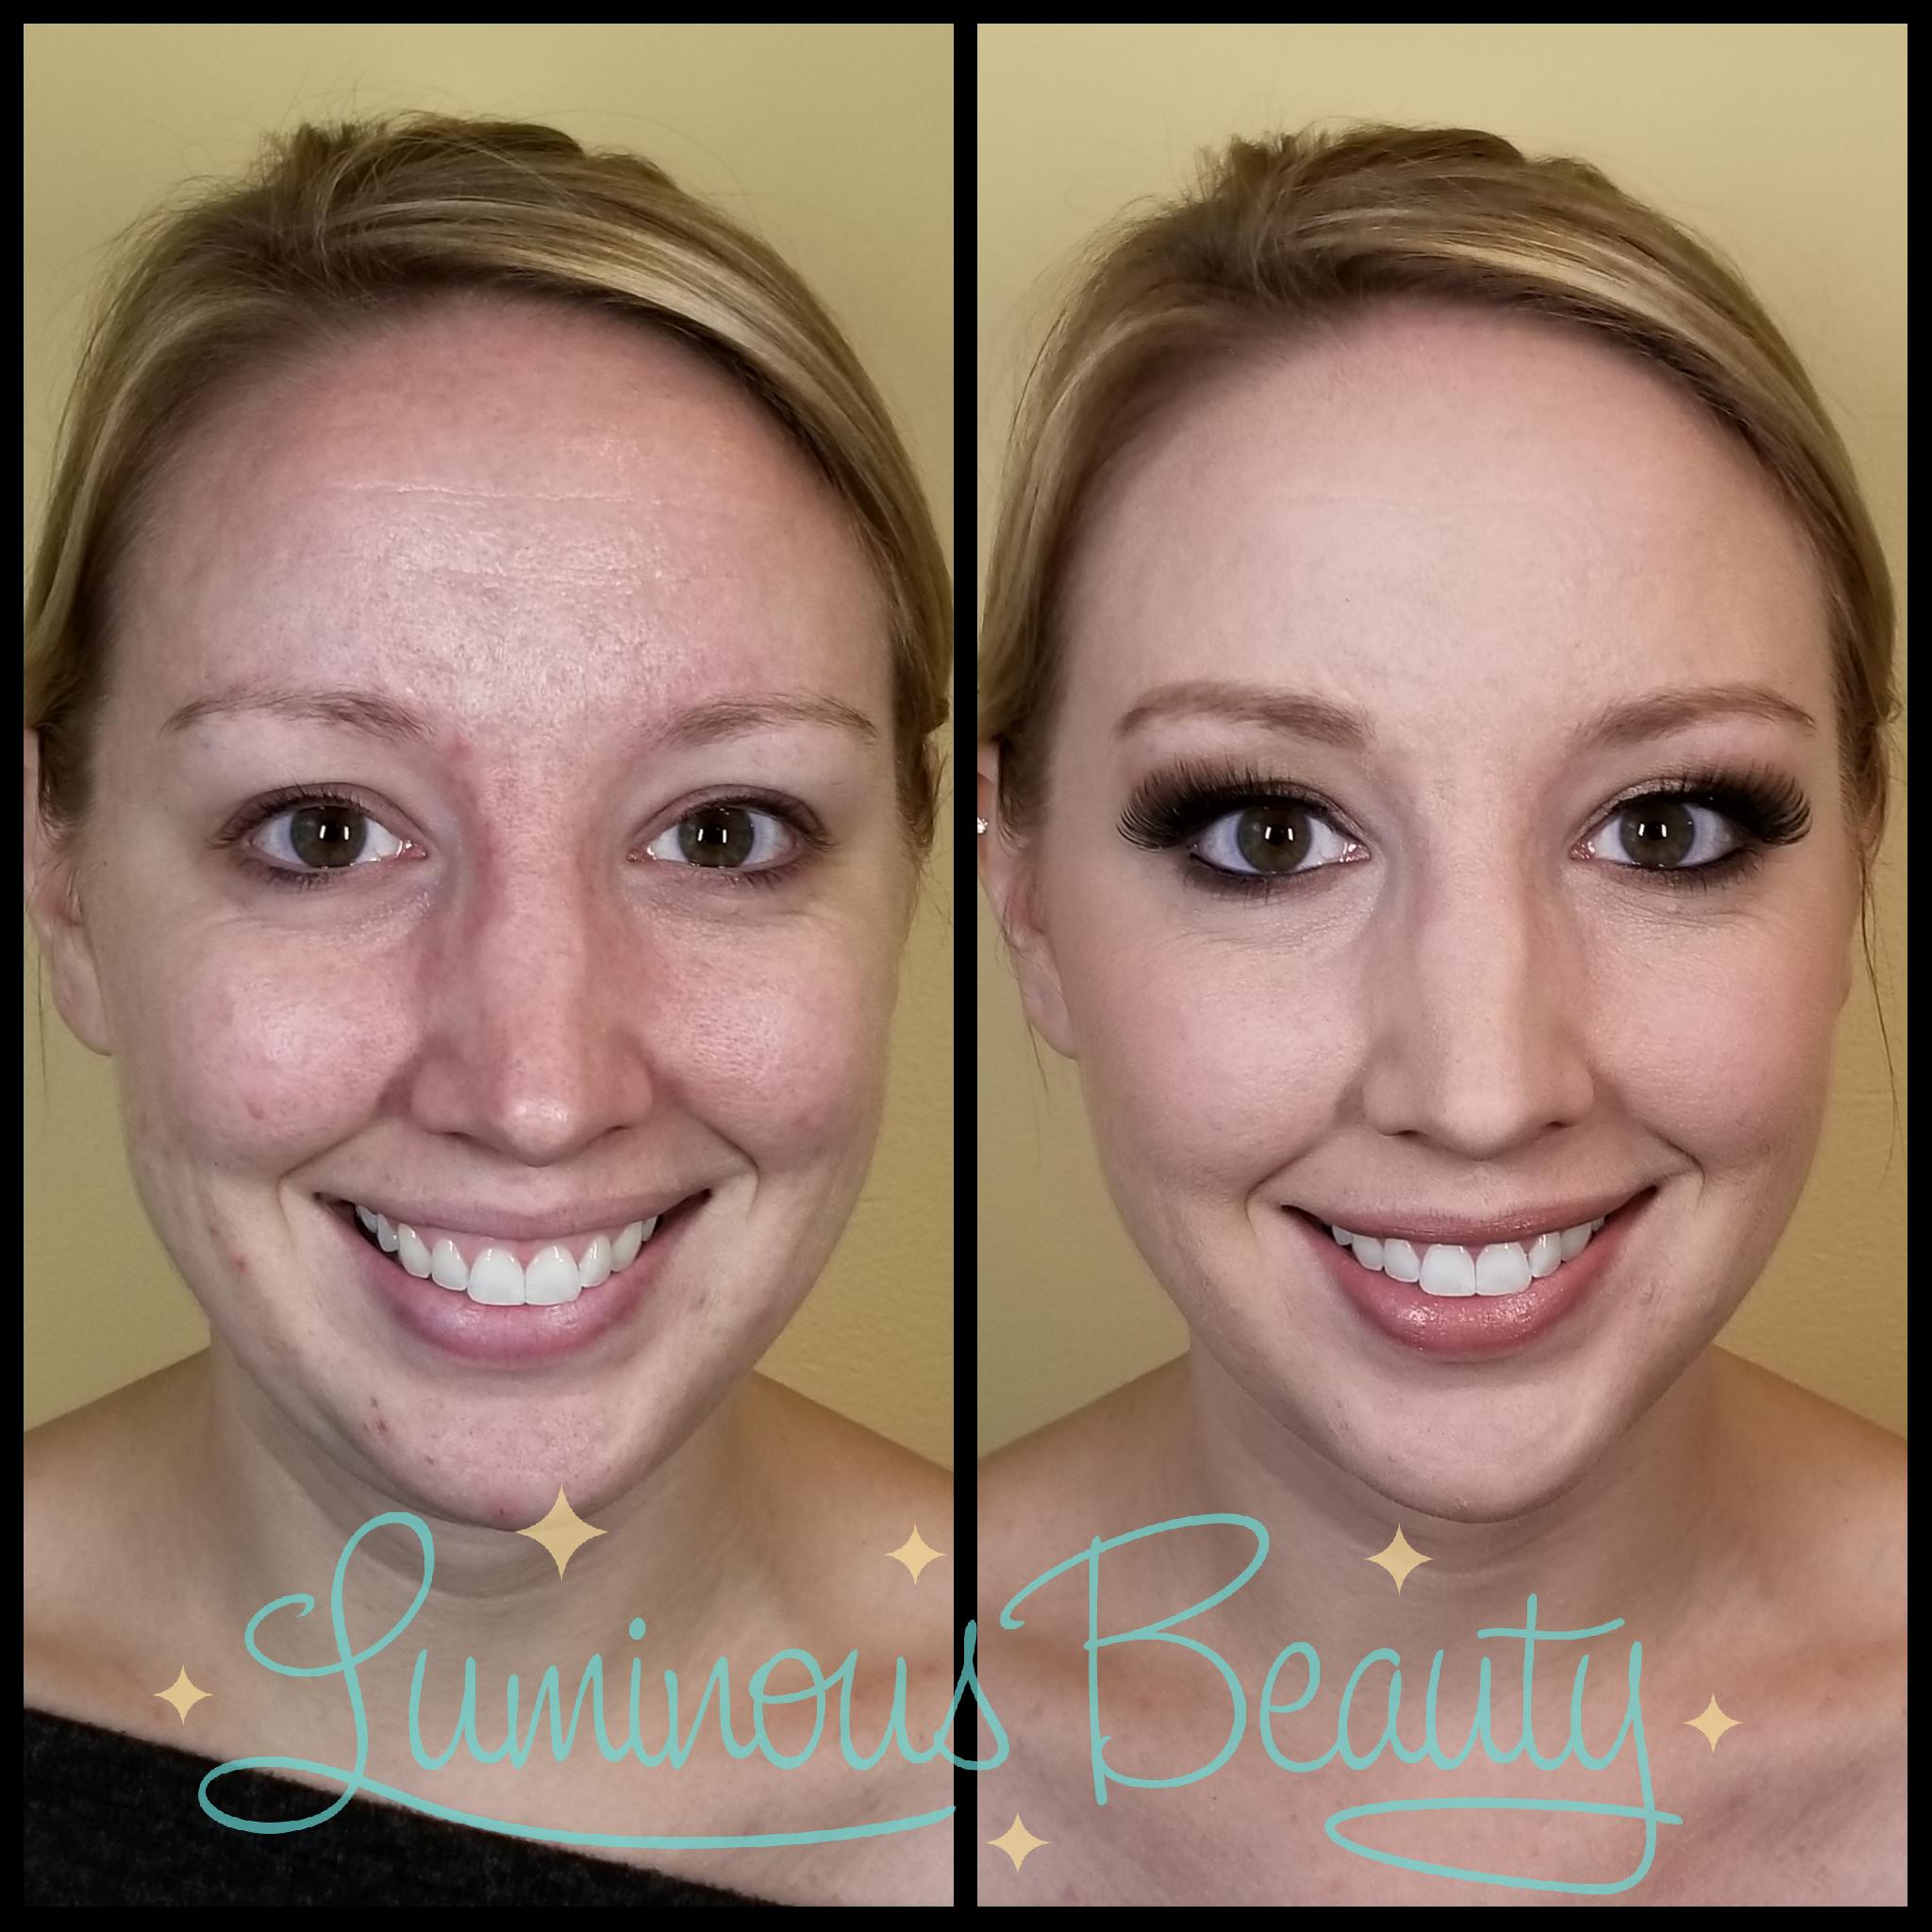 10-05-18  Super Smokey Bridesmaids Makeup. Acne Covering Makeup. Minneapolis Makeup Artist. Luminous Beauty Makeup Artist. Best of The Knot Weddings Artist..png